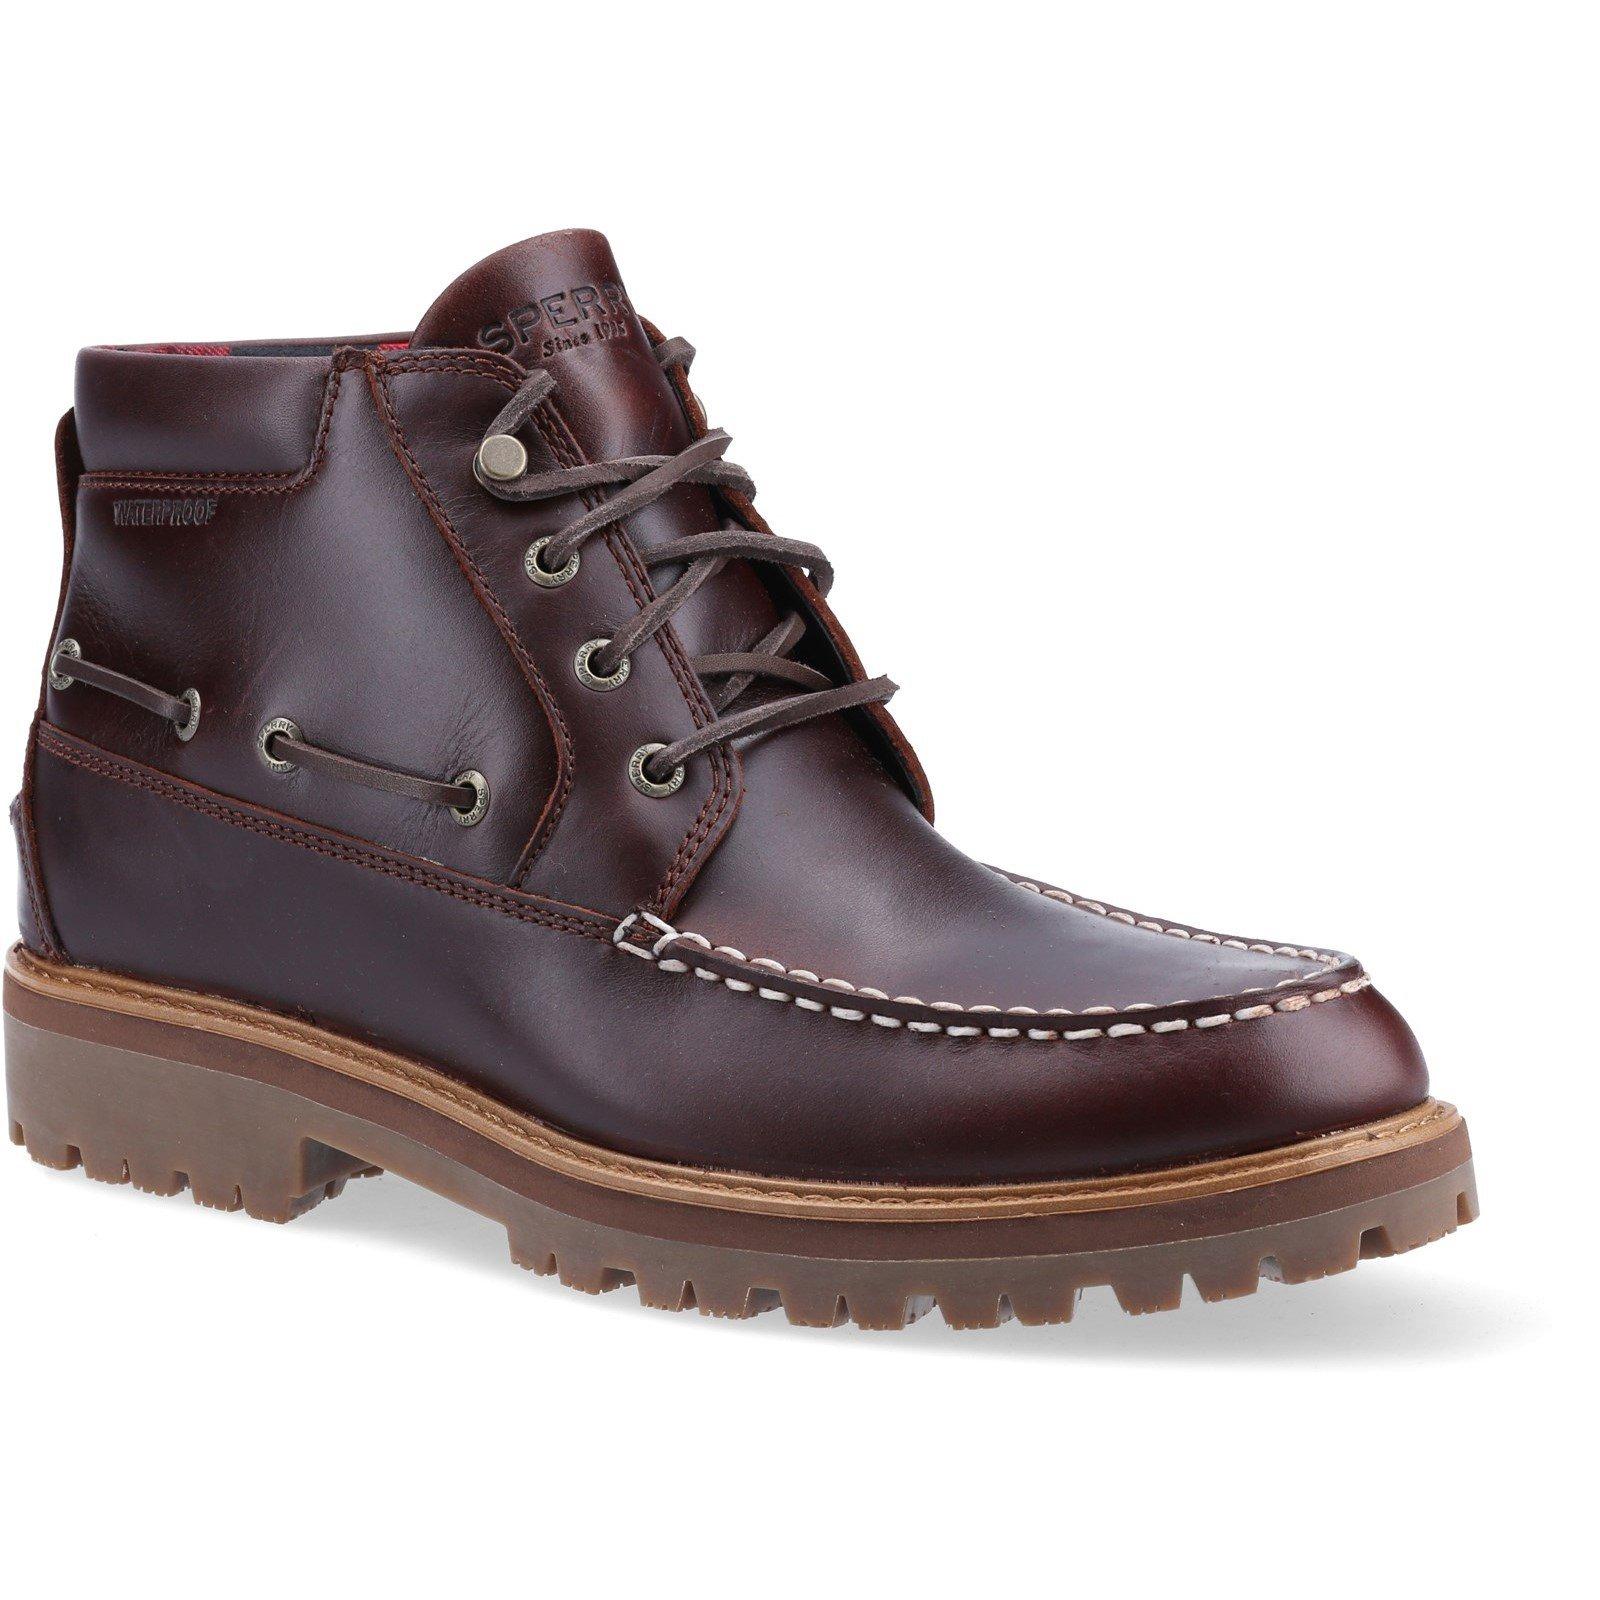 Sperry Men's Authentic Original Lug Chukka Boot Various Colours 32068 - Amaretto 10